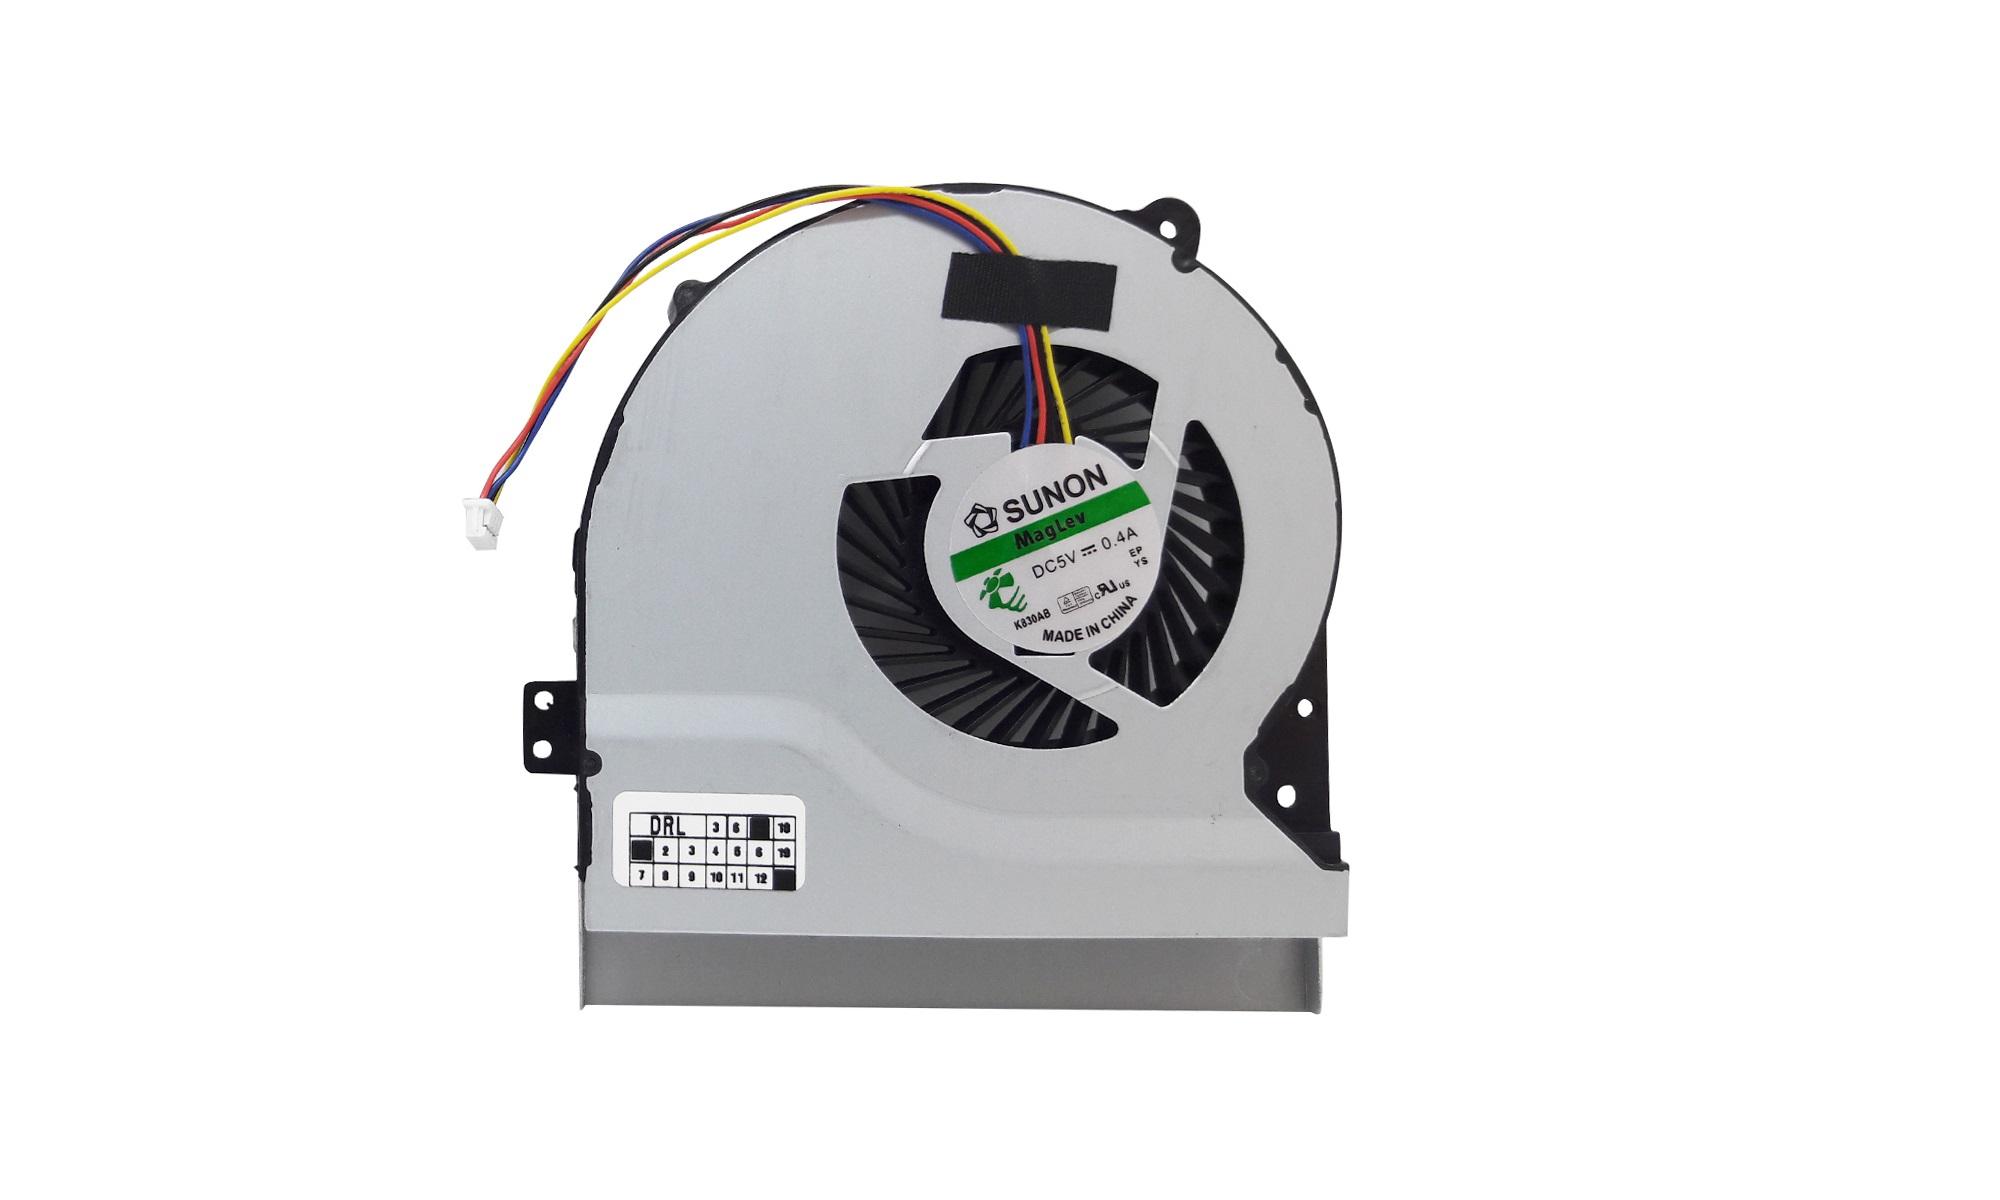 Cooler compatibil Asus X550LD,X550LN, X550MD, X550MJ, X550VB, X550VC, X550VL, X550WE, model Sunon